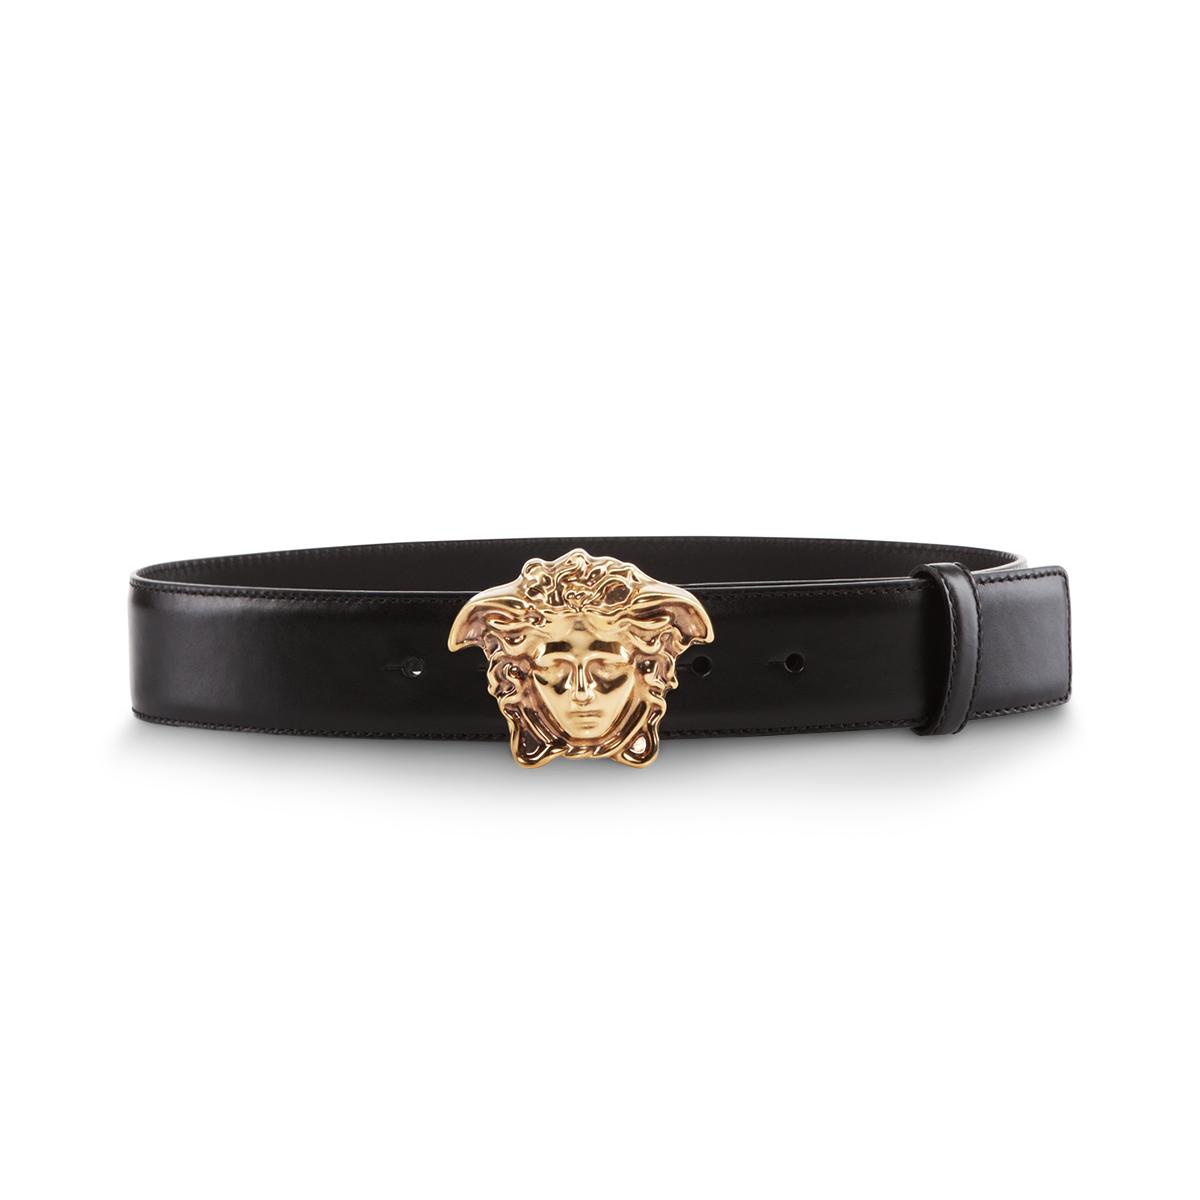 231bee62e Striking black. Find more #Versace Men's belts on versace.com ...